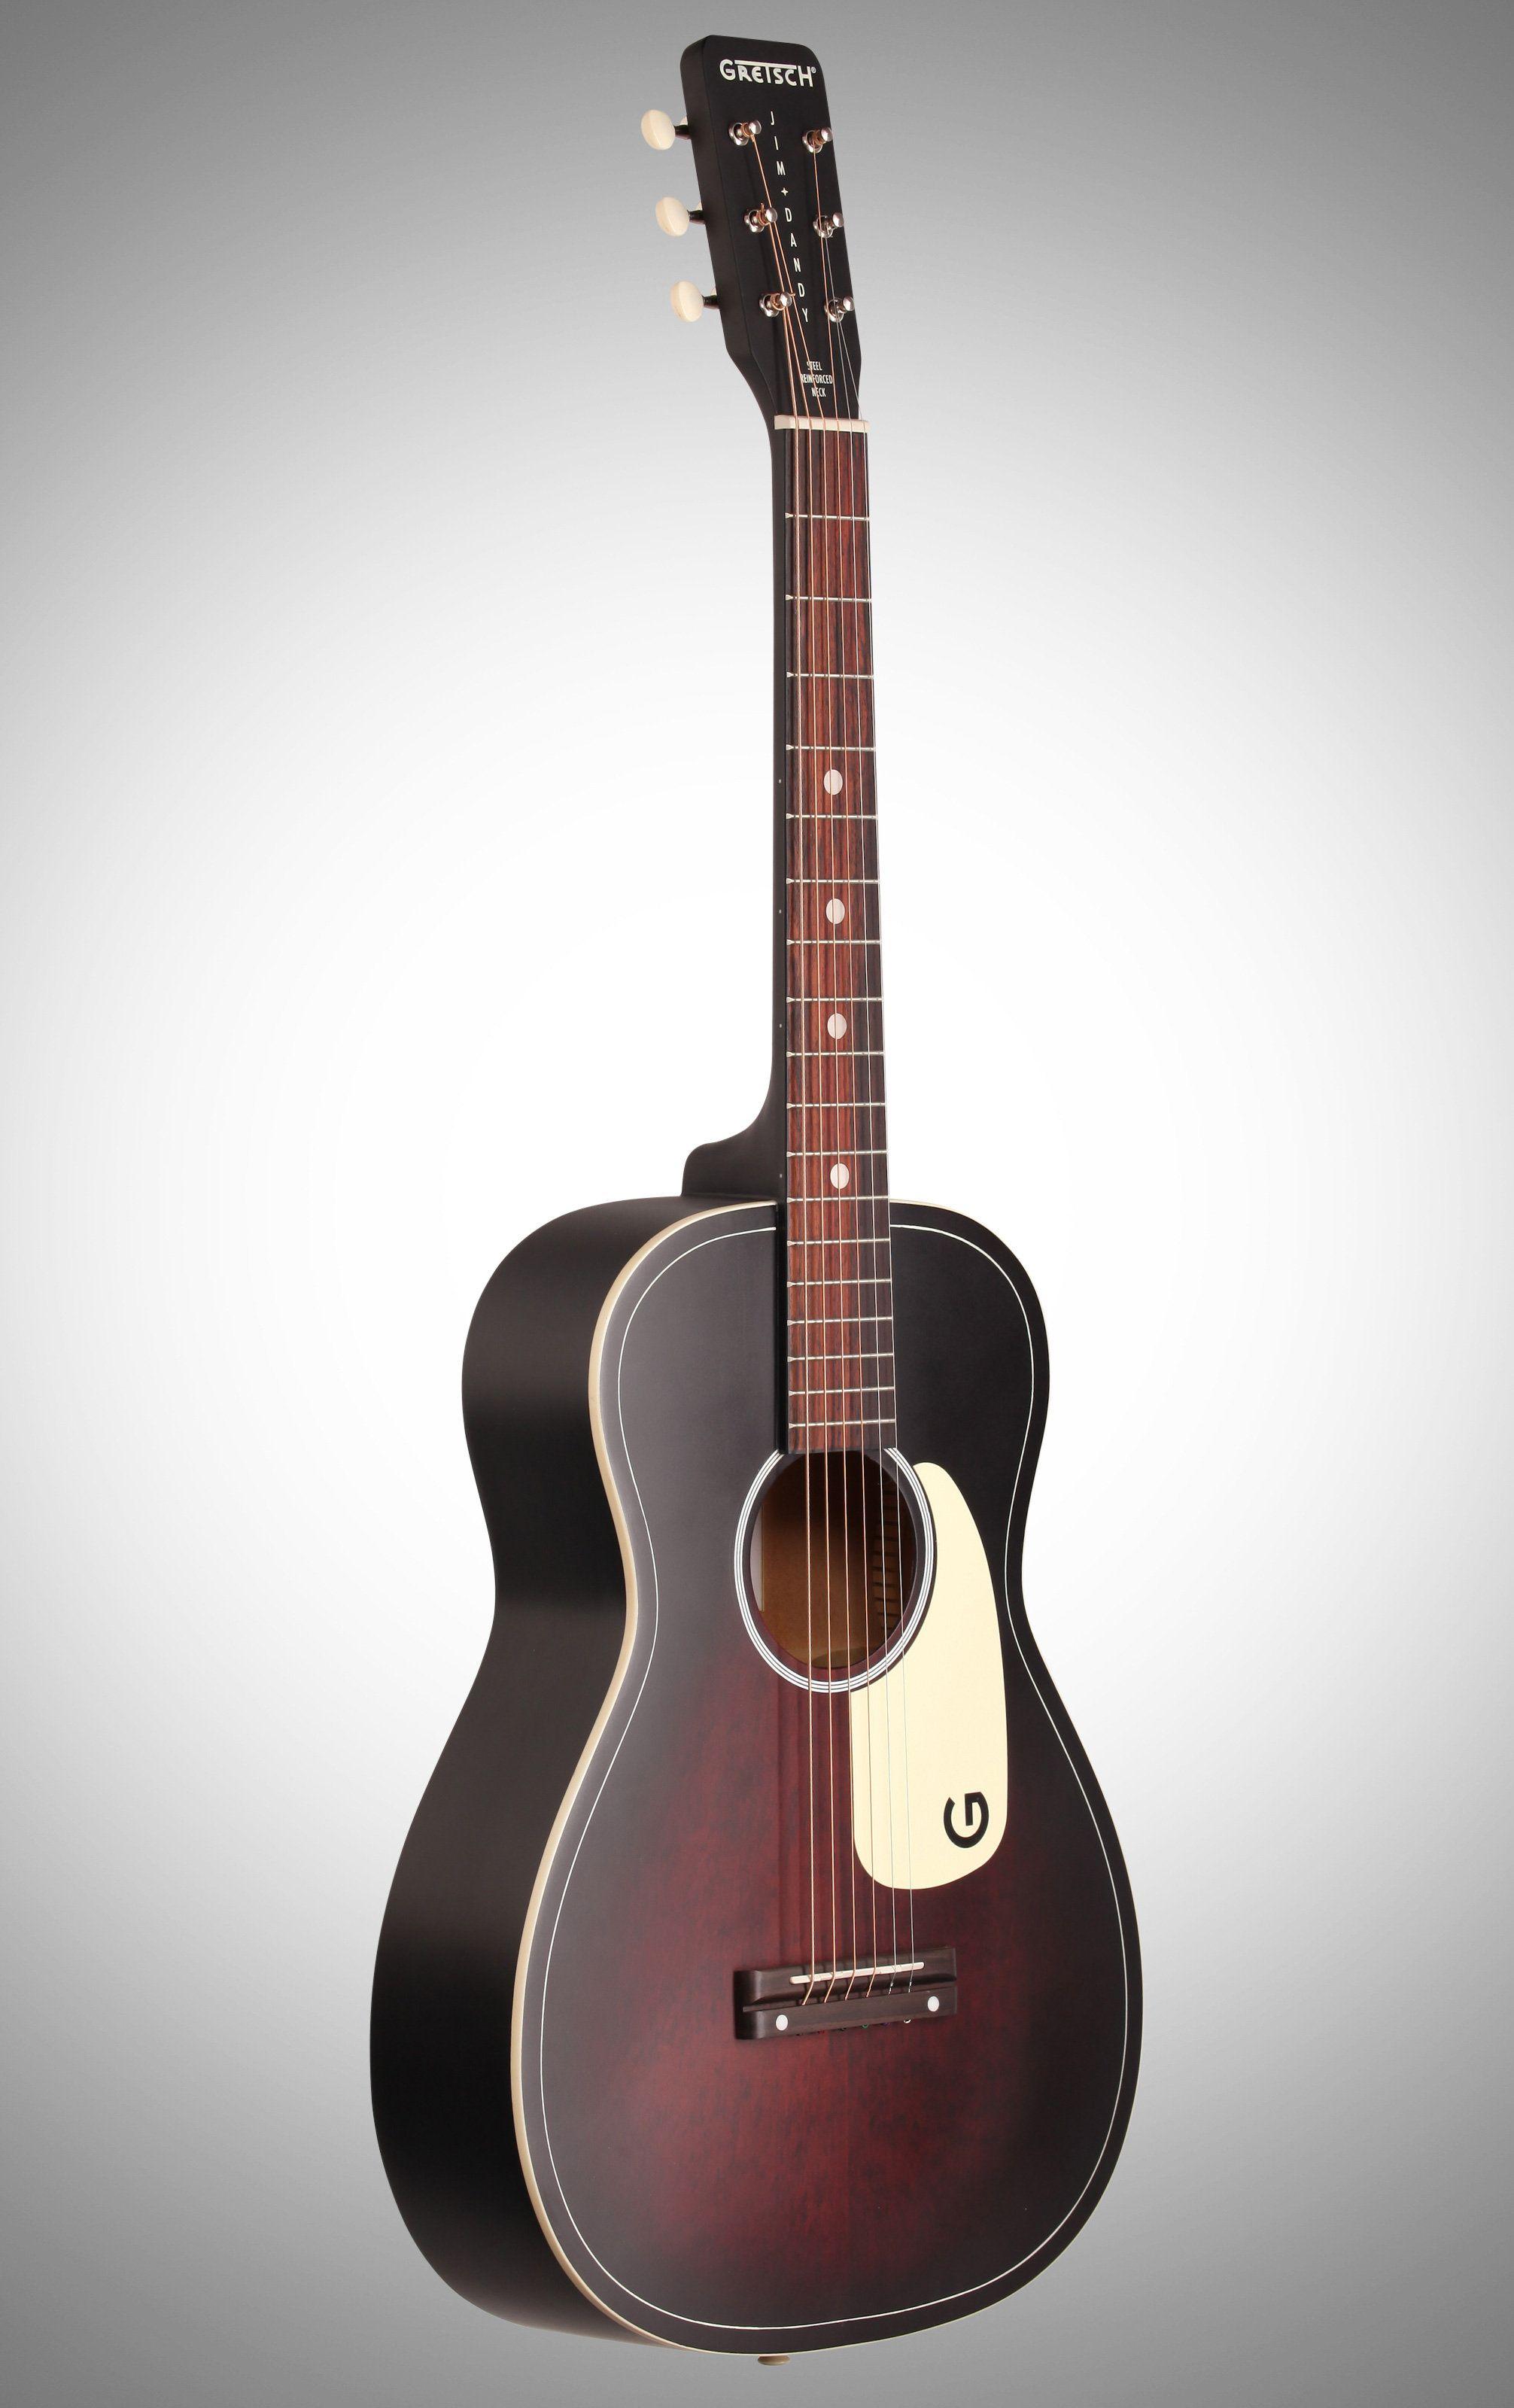 Gretsch g9500 jim dandy parlor flat top acoustic guitar